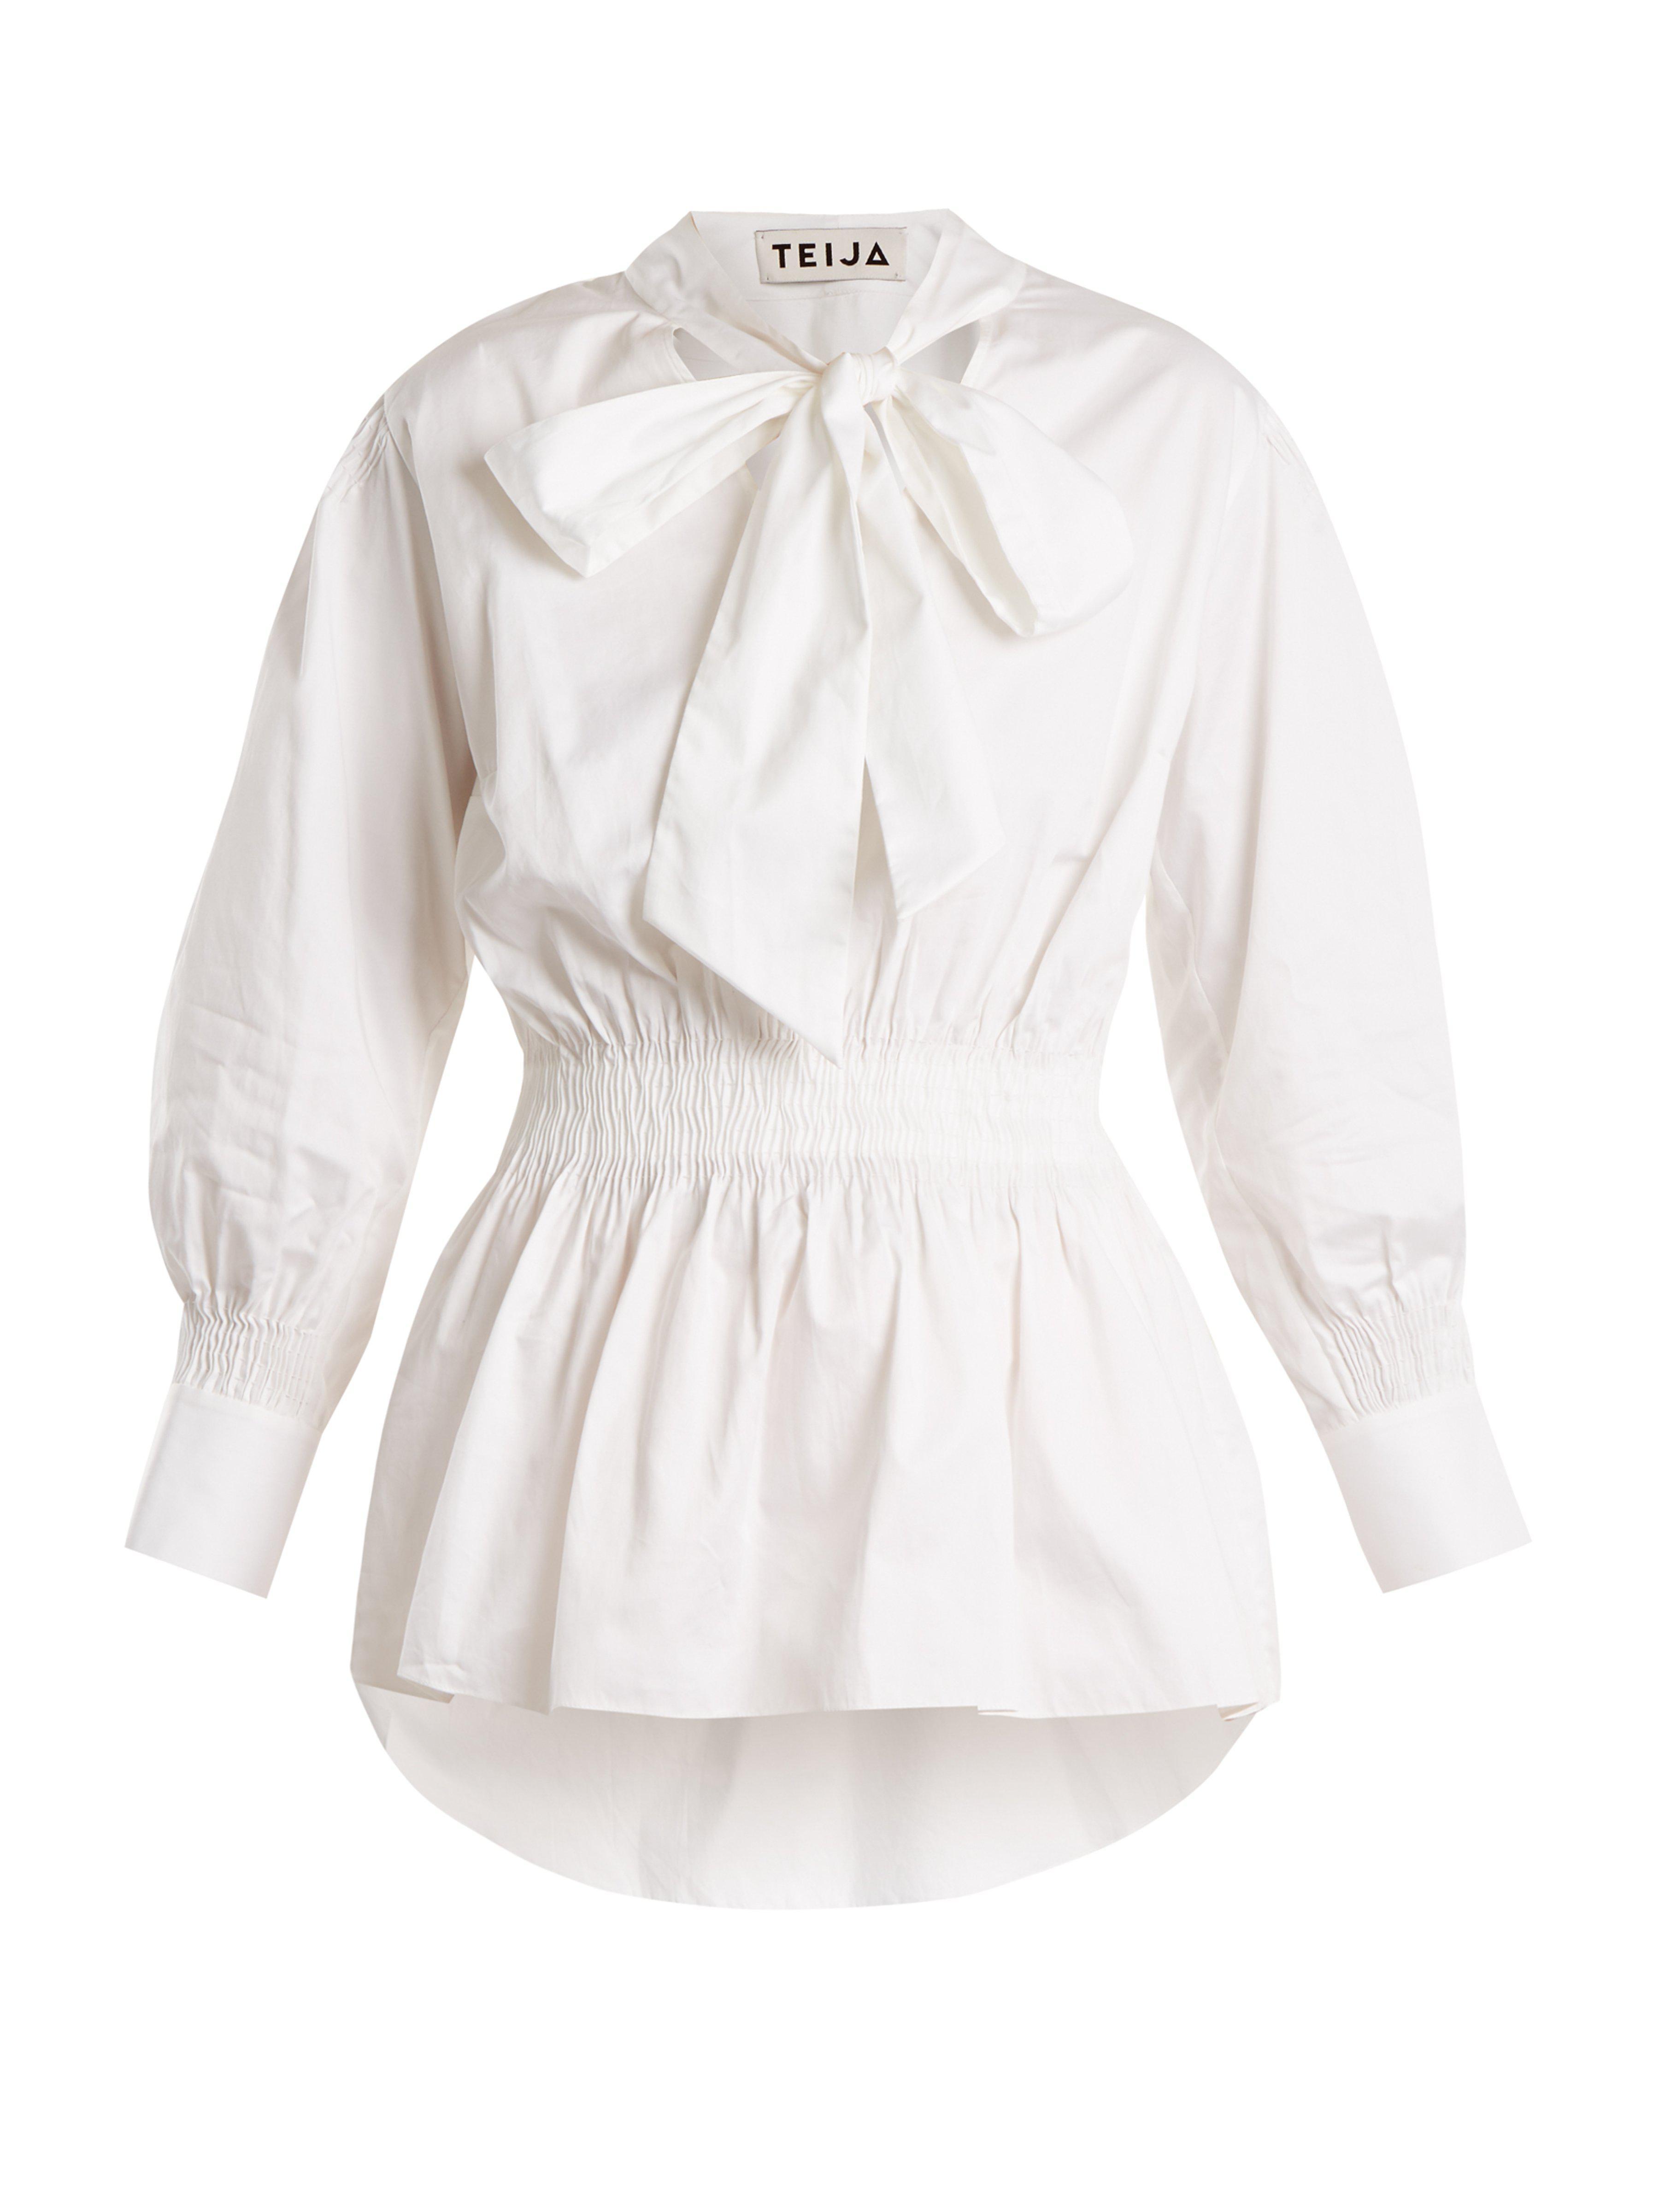 Cotton Teija Neck Top Tie Lyst White wnaq6A